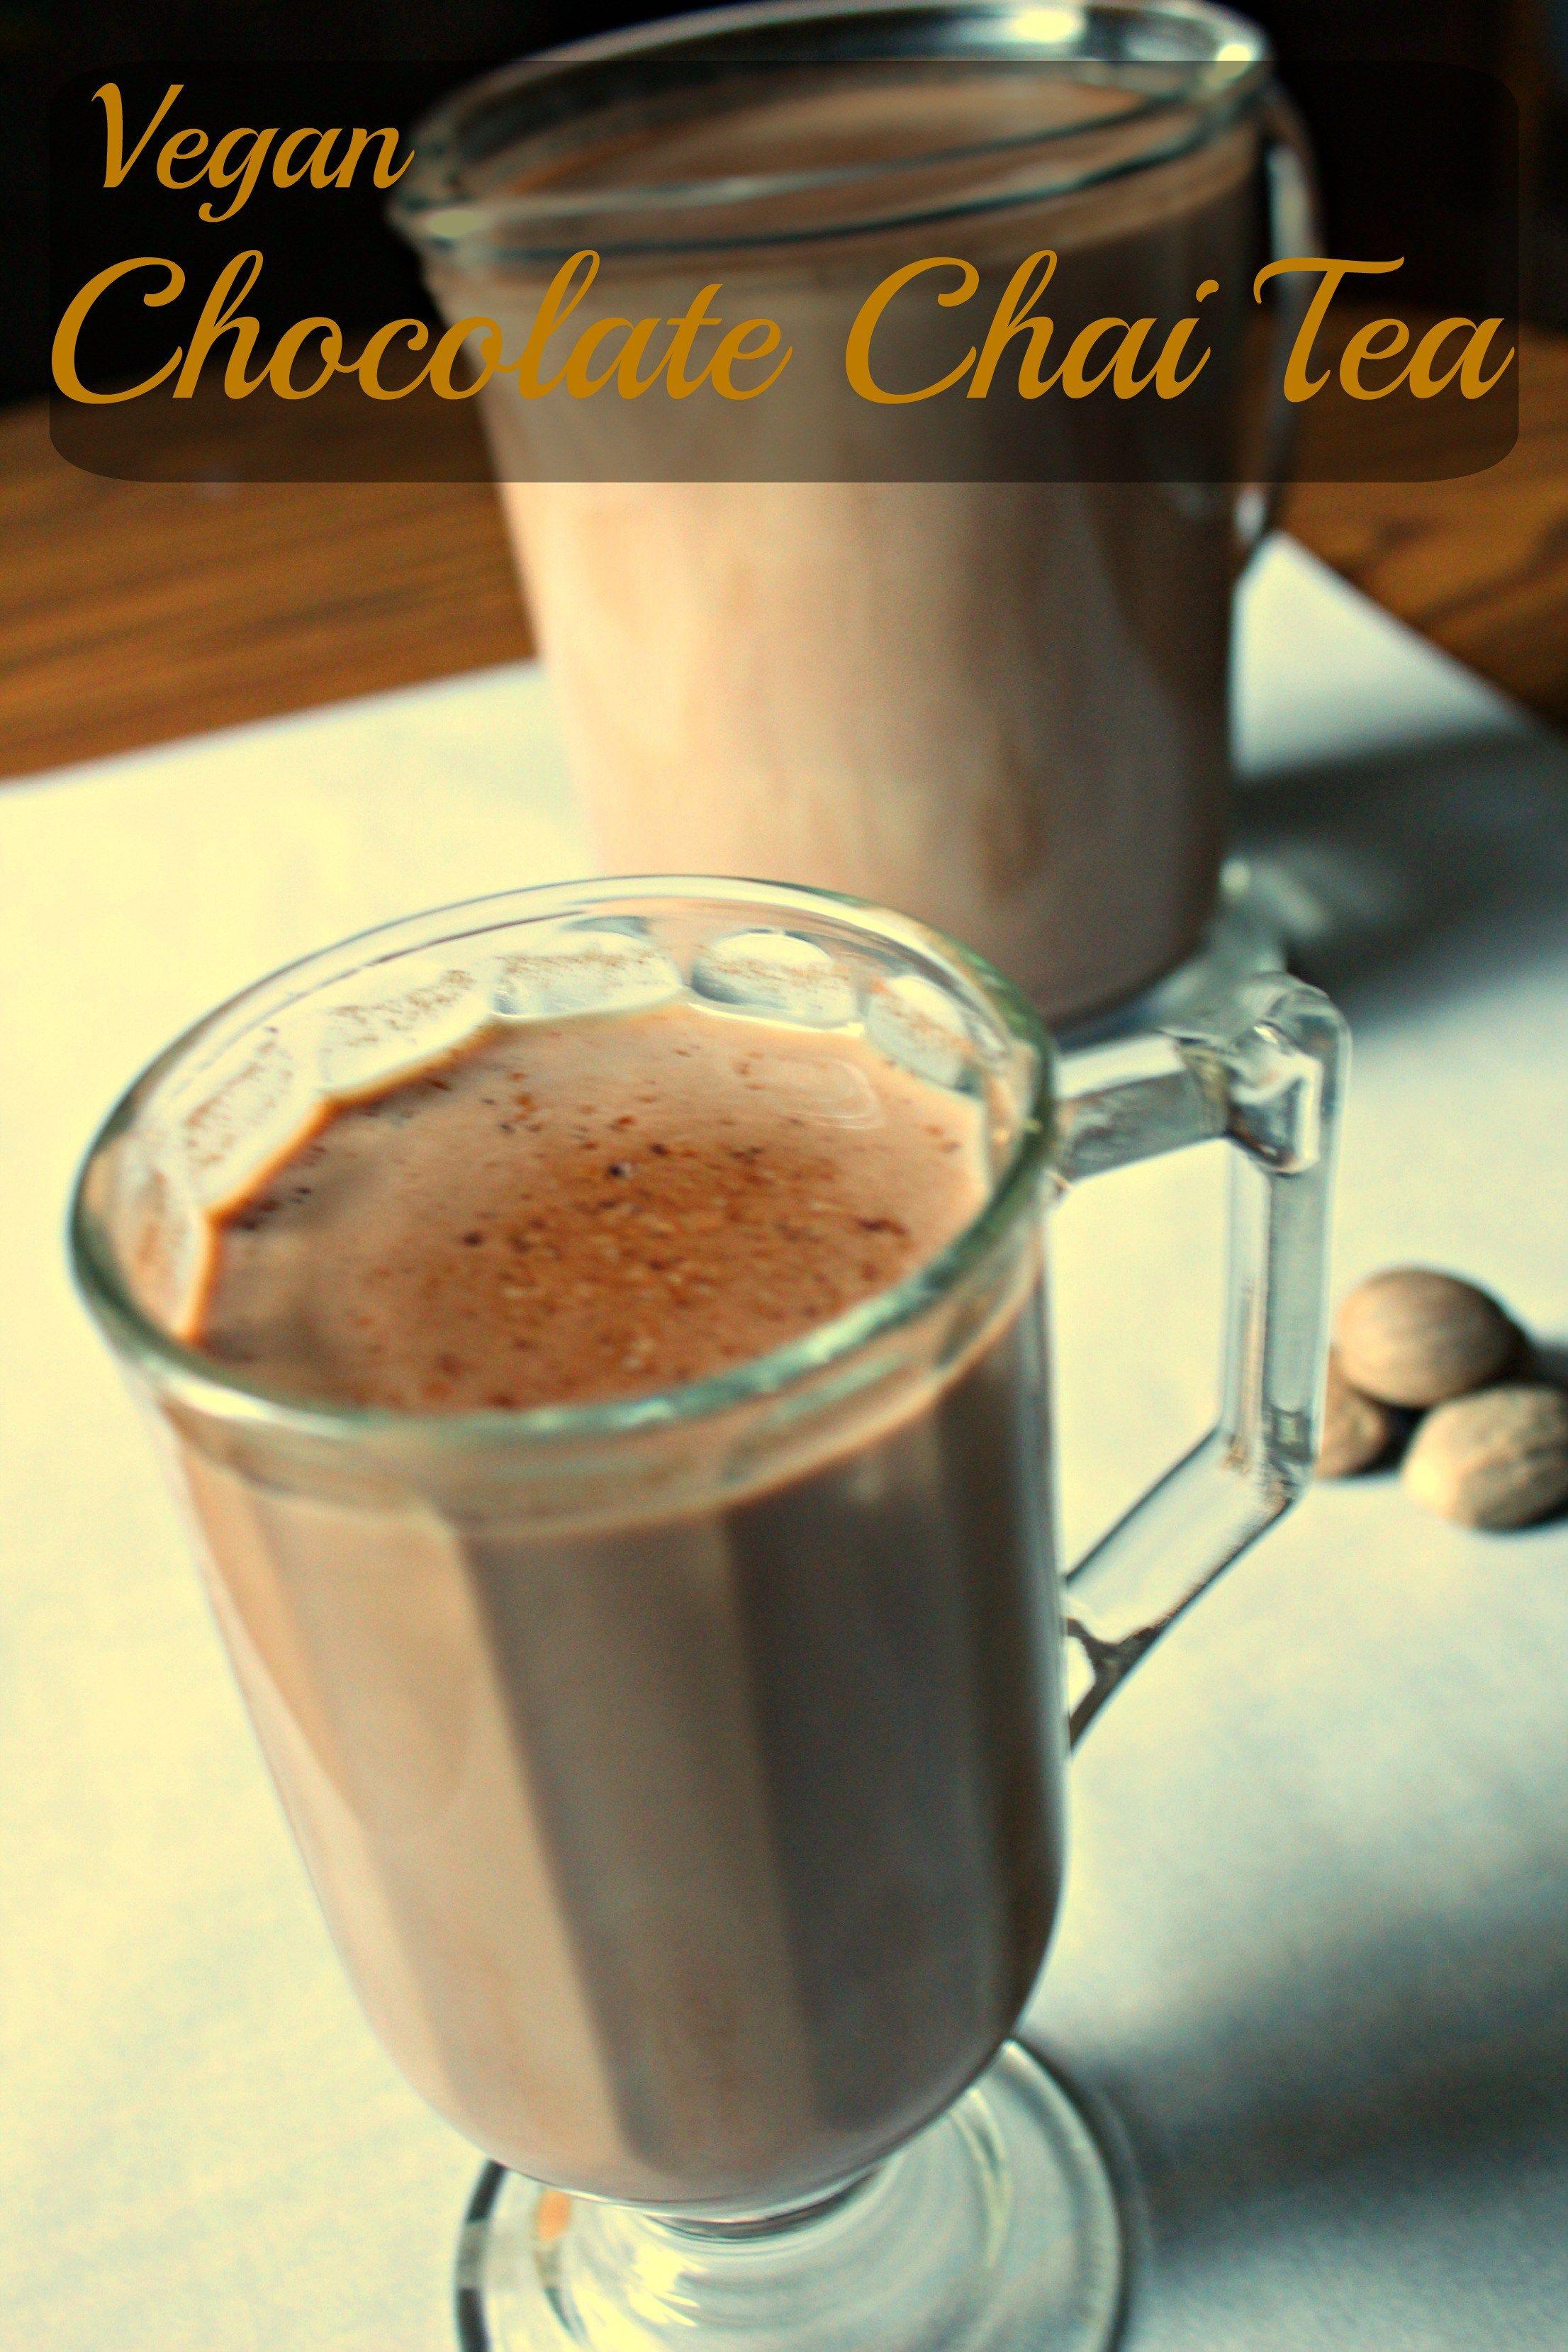 Vegan Chocolate Chai Tea Not Too Shabby Gabby Recipe Vegan Chocolate Chocolate Chai Tea Recipe Chai Tea